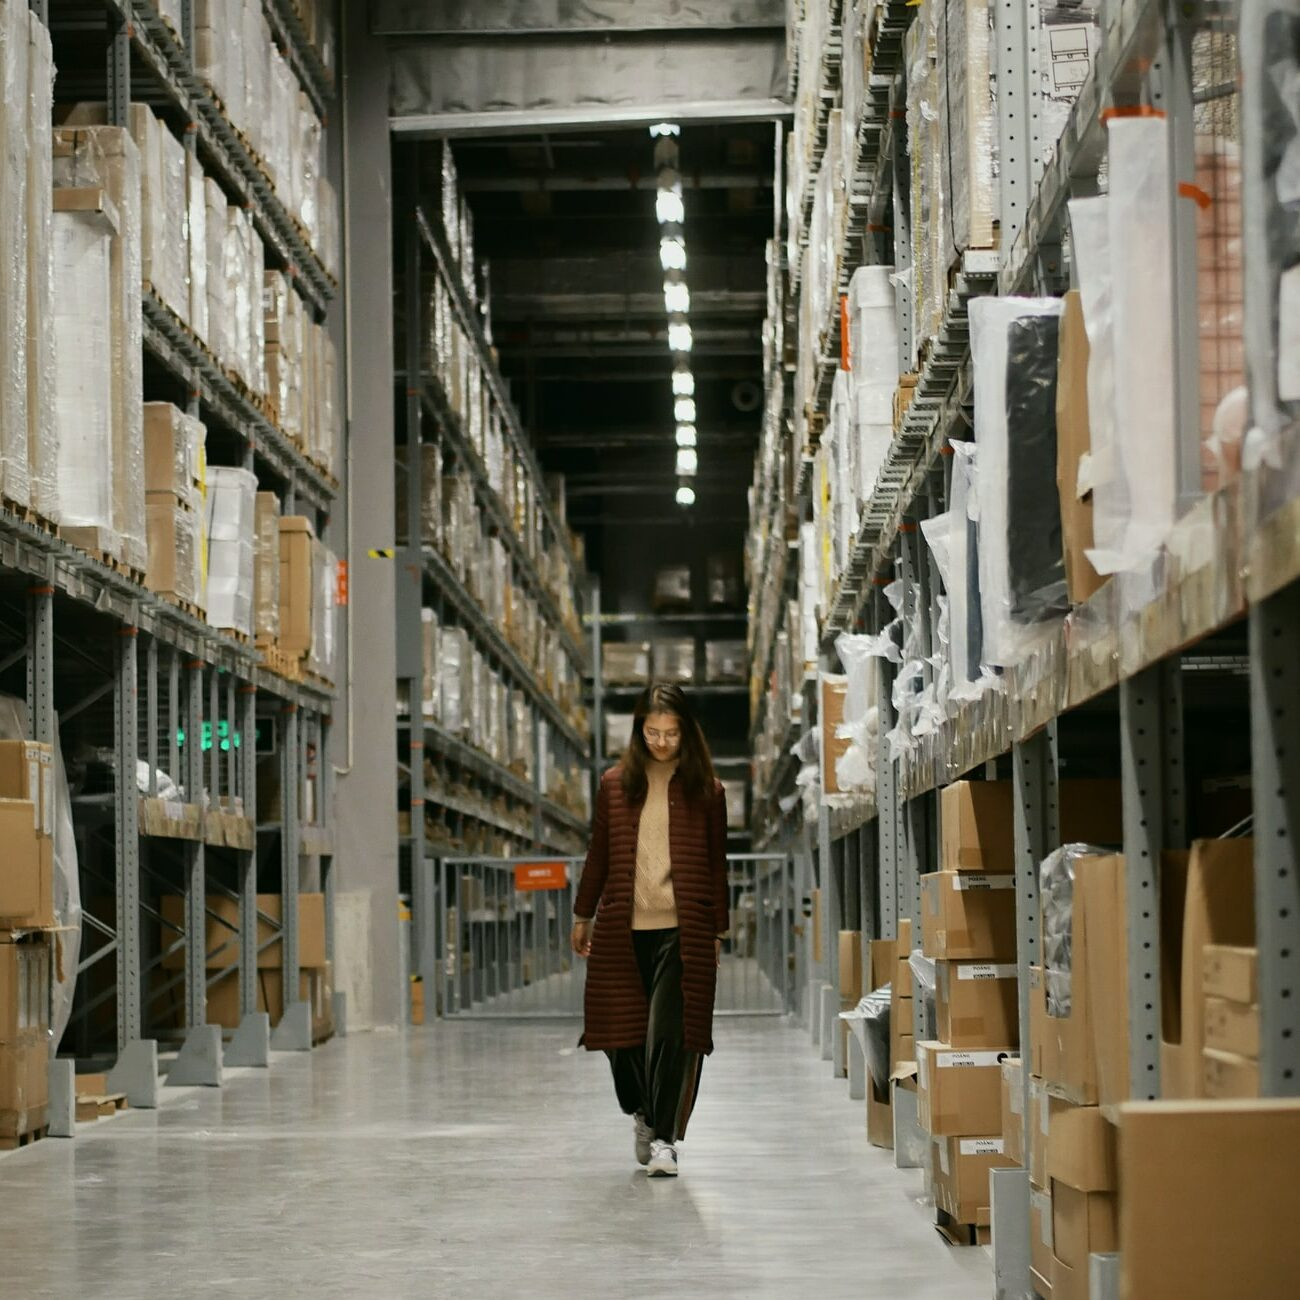 woman walking in a cannabis distribution warehouse at night